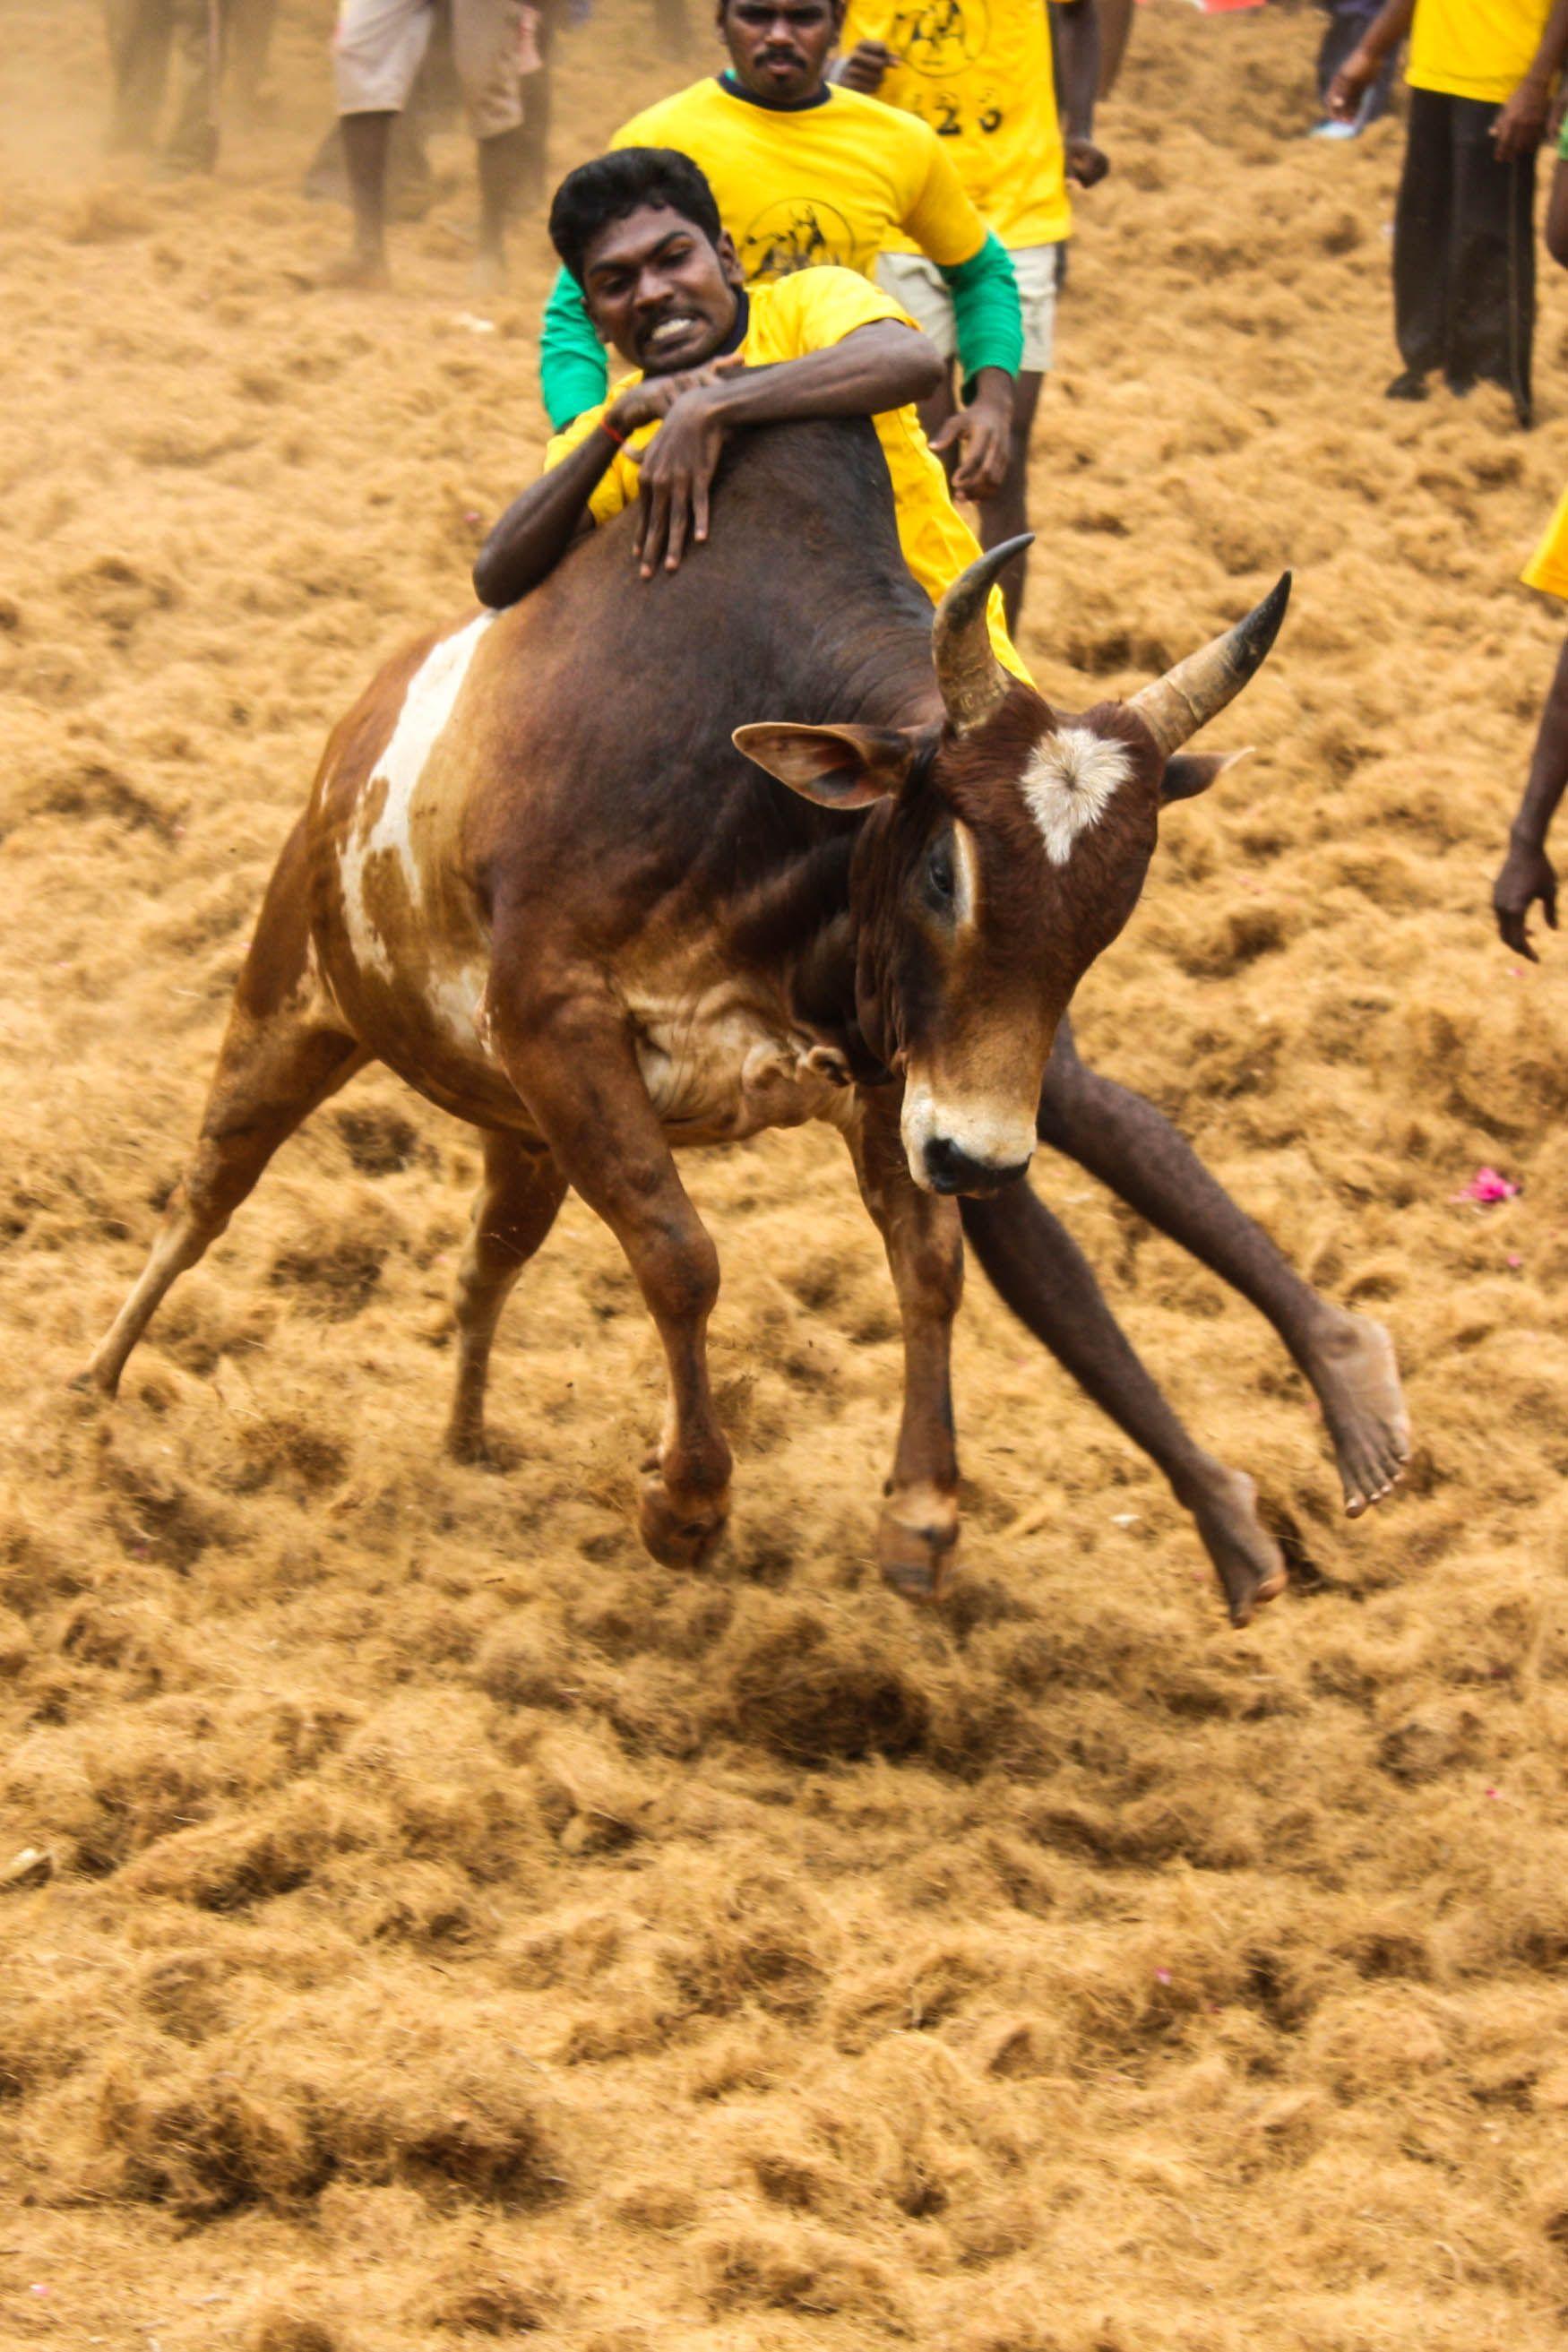 Pin by saranya nagarajan on our bravery tamilnadu pinterest india incredible india and culture